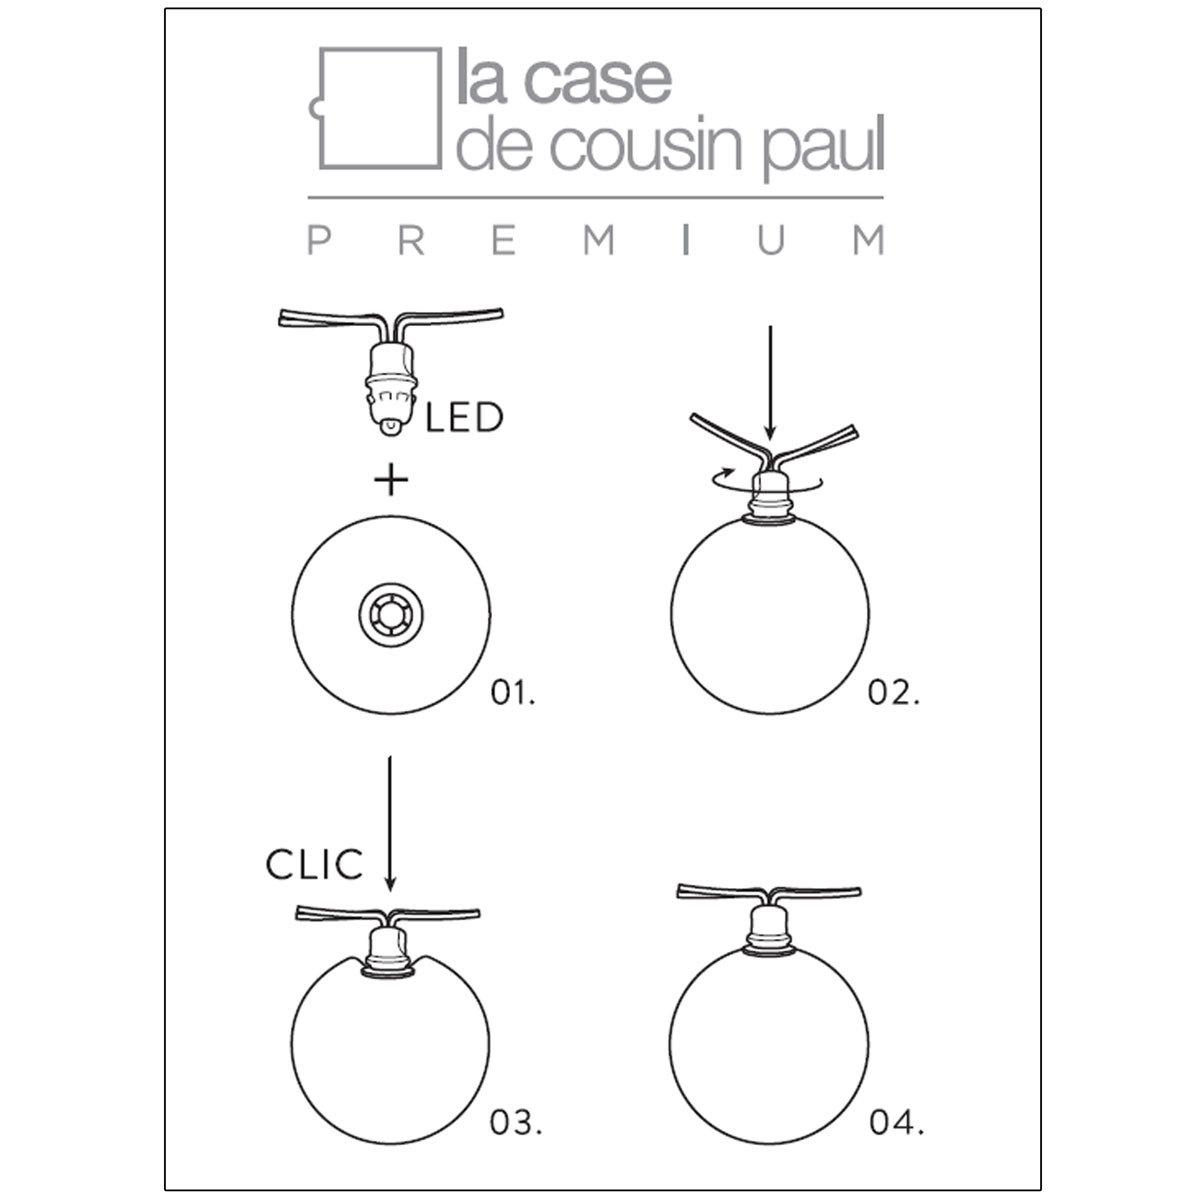 la case de cousin paul guirlande lumineuse joan led 20 boules suspension d corative la case. Black Bedroom Furniture Sets. Home Design Ideas